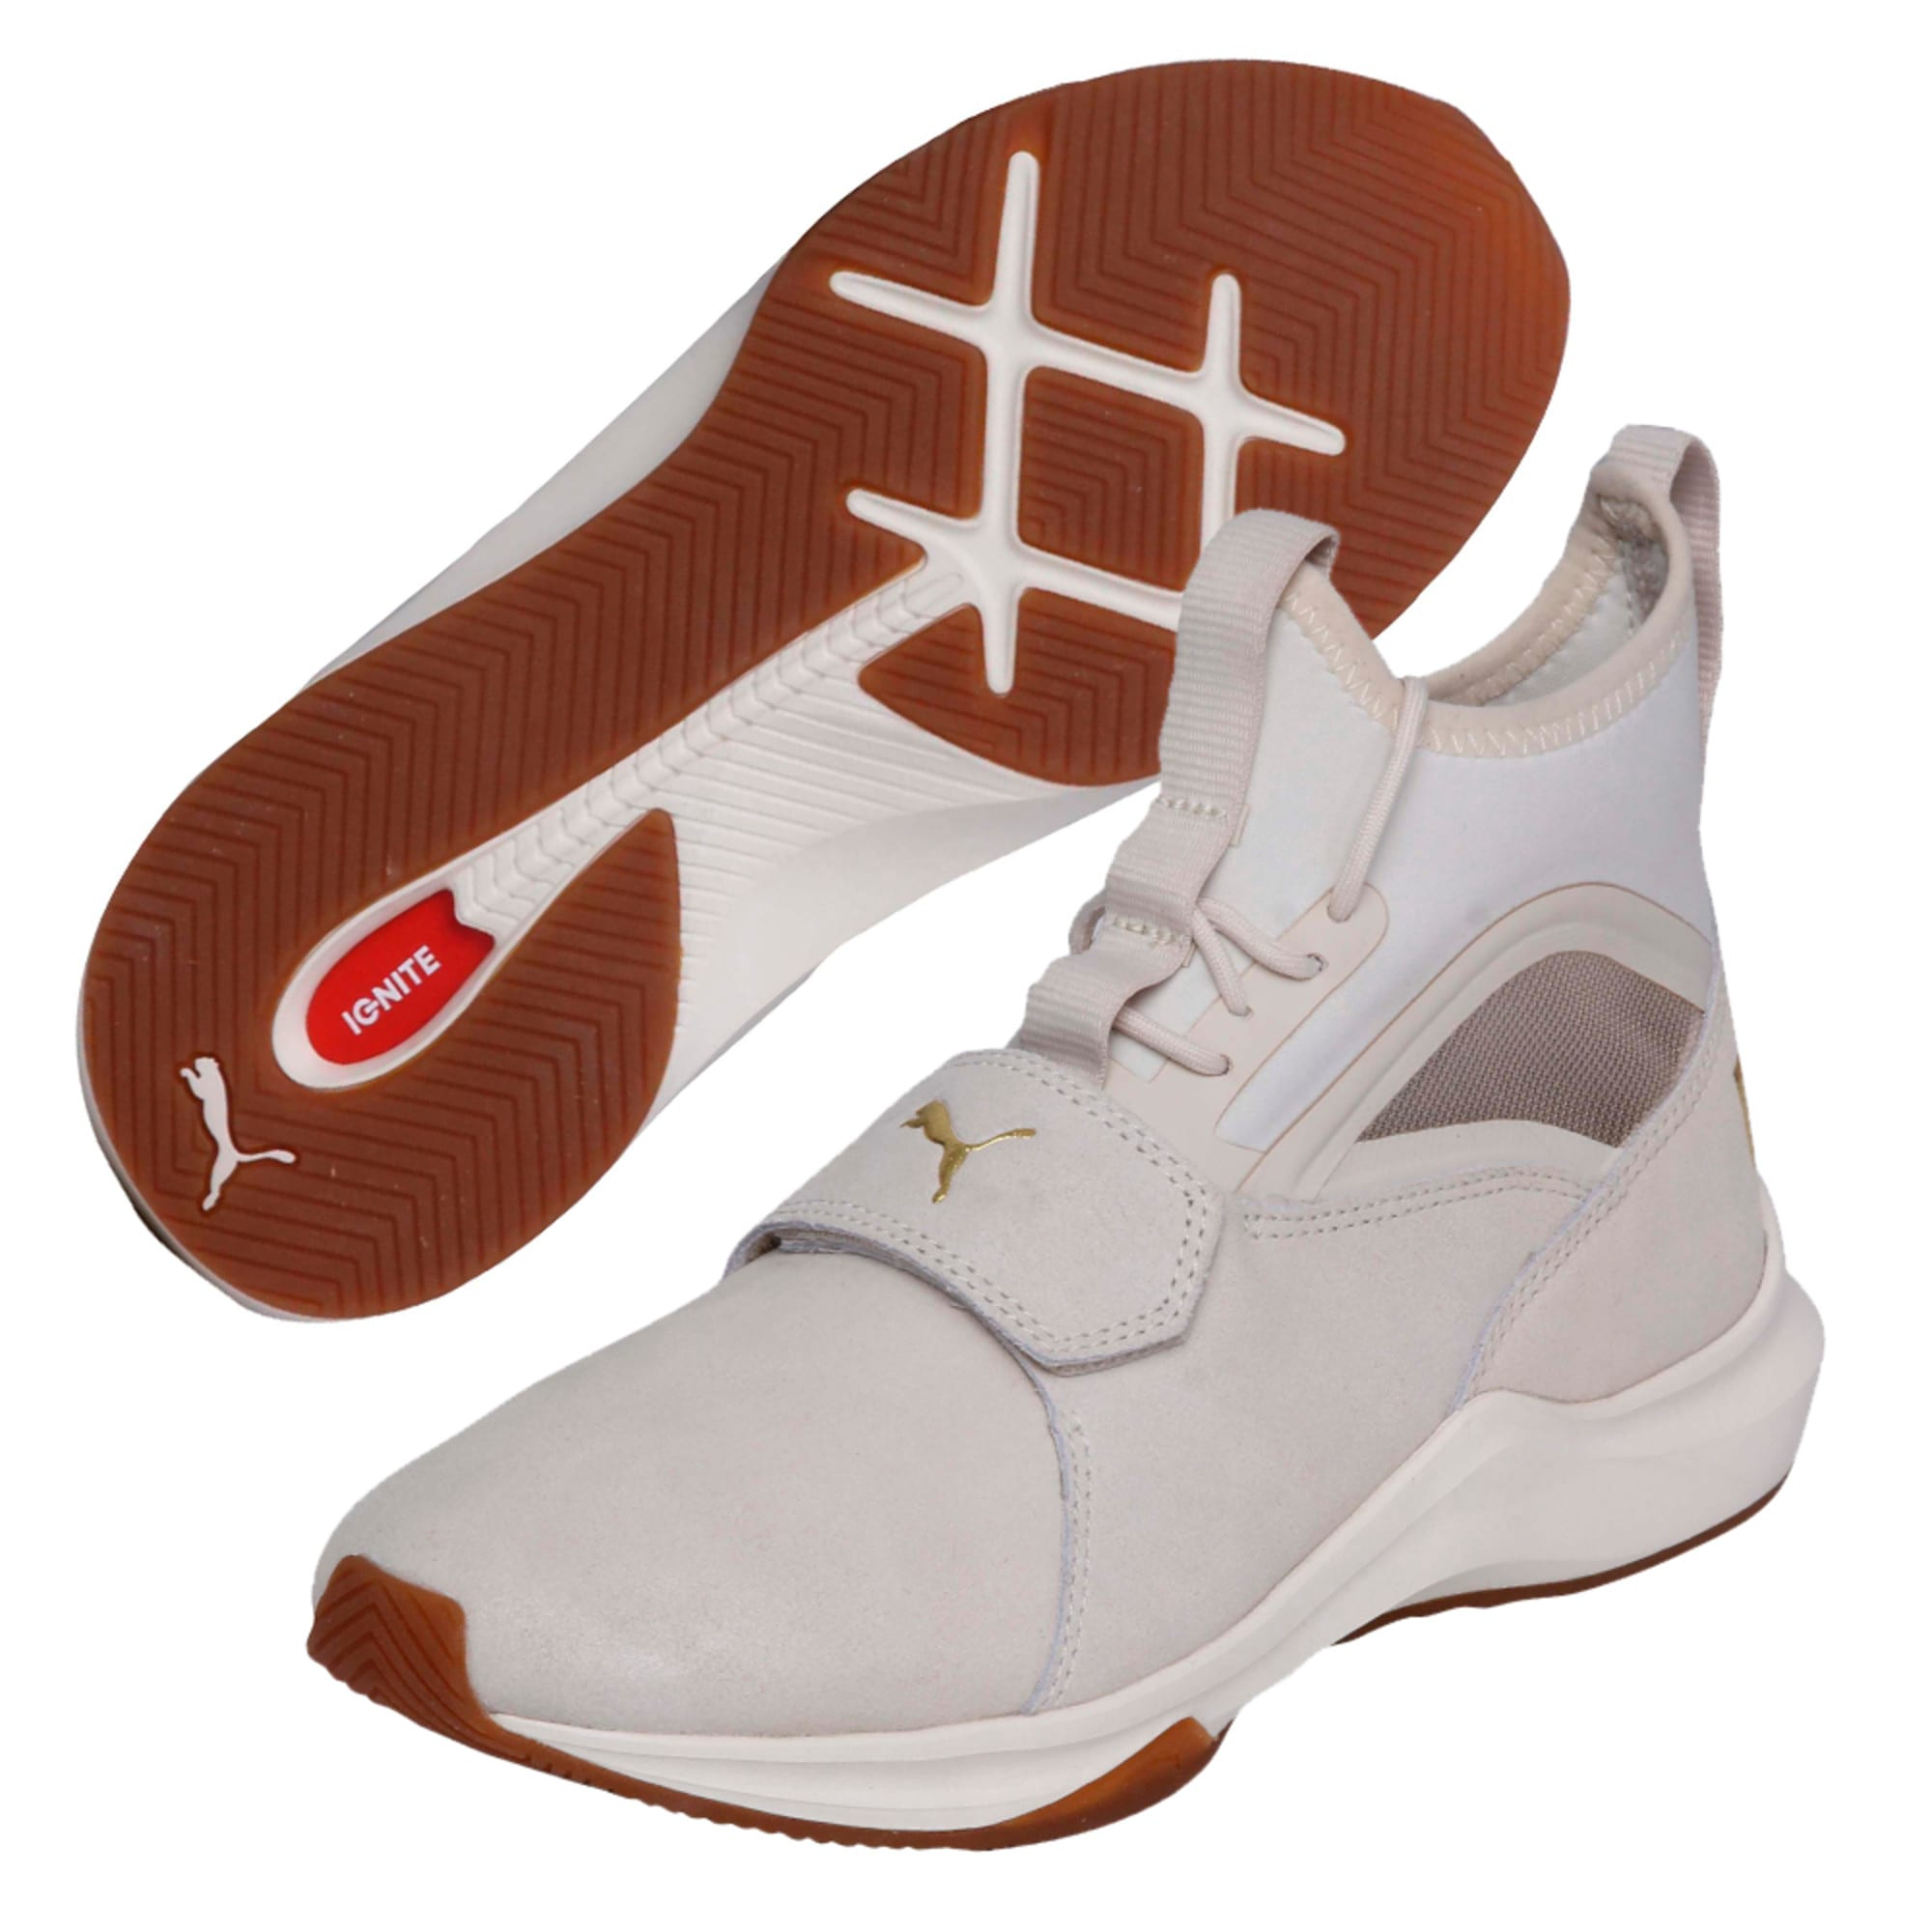 Thumbnail 2 of Phenom Shimmer Women's Training Shoes, Birch-Whisper White, medium-IND